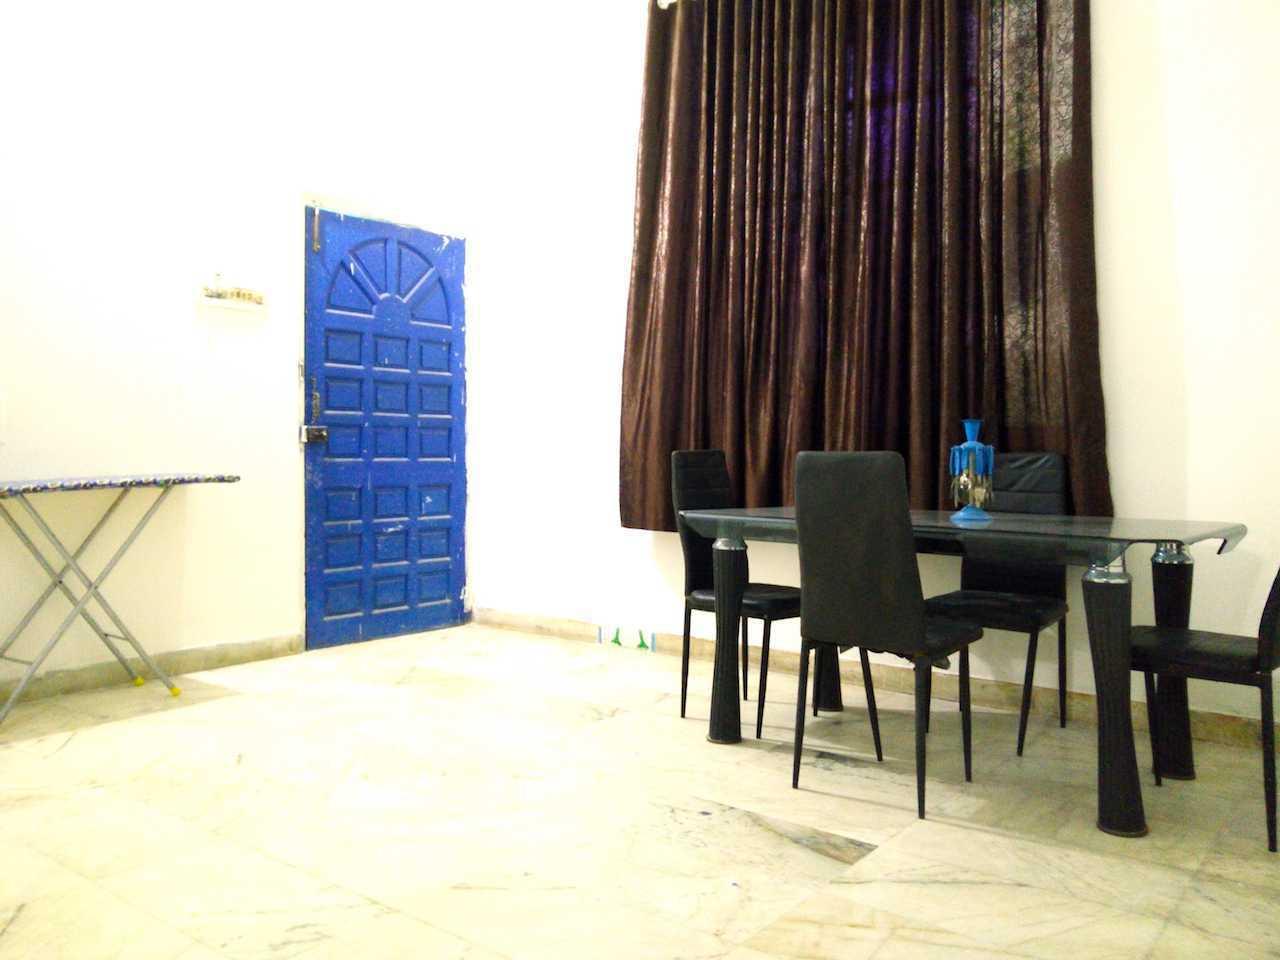 Mit Enclave, House No. 4, Kalyani Nagar, Mit Enclave, House No. 4 - GetSetHome